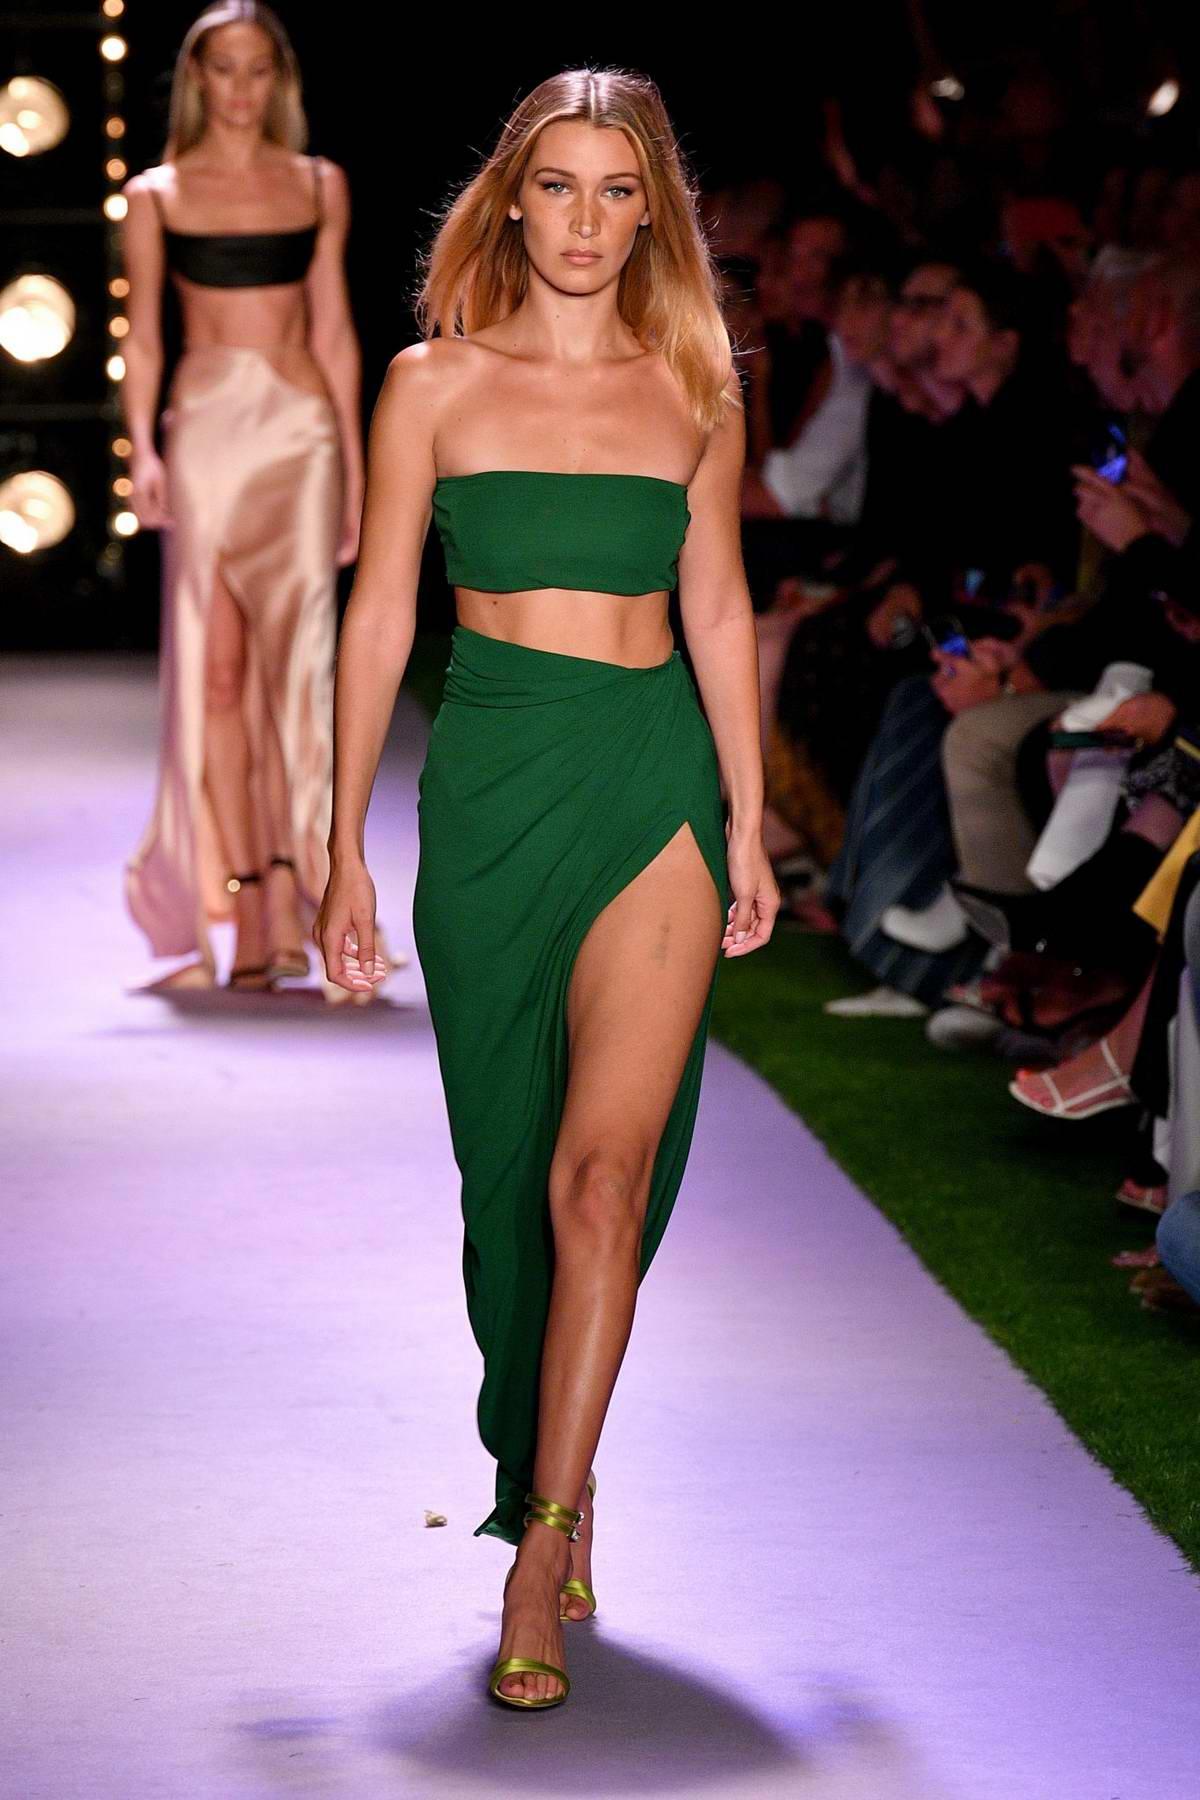 Bella Hadid walks the runway for Brandon Maxwell during New York Fashion Week in New York City